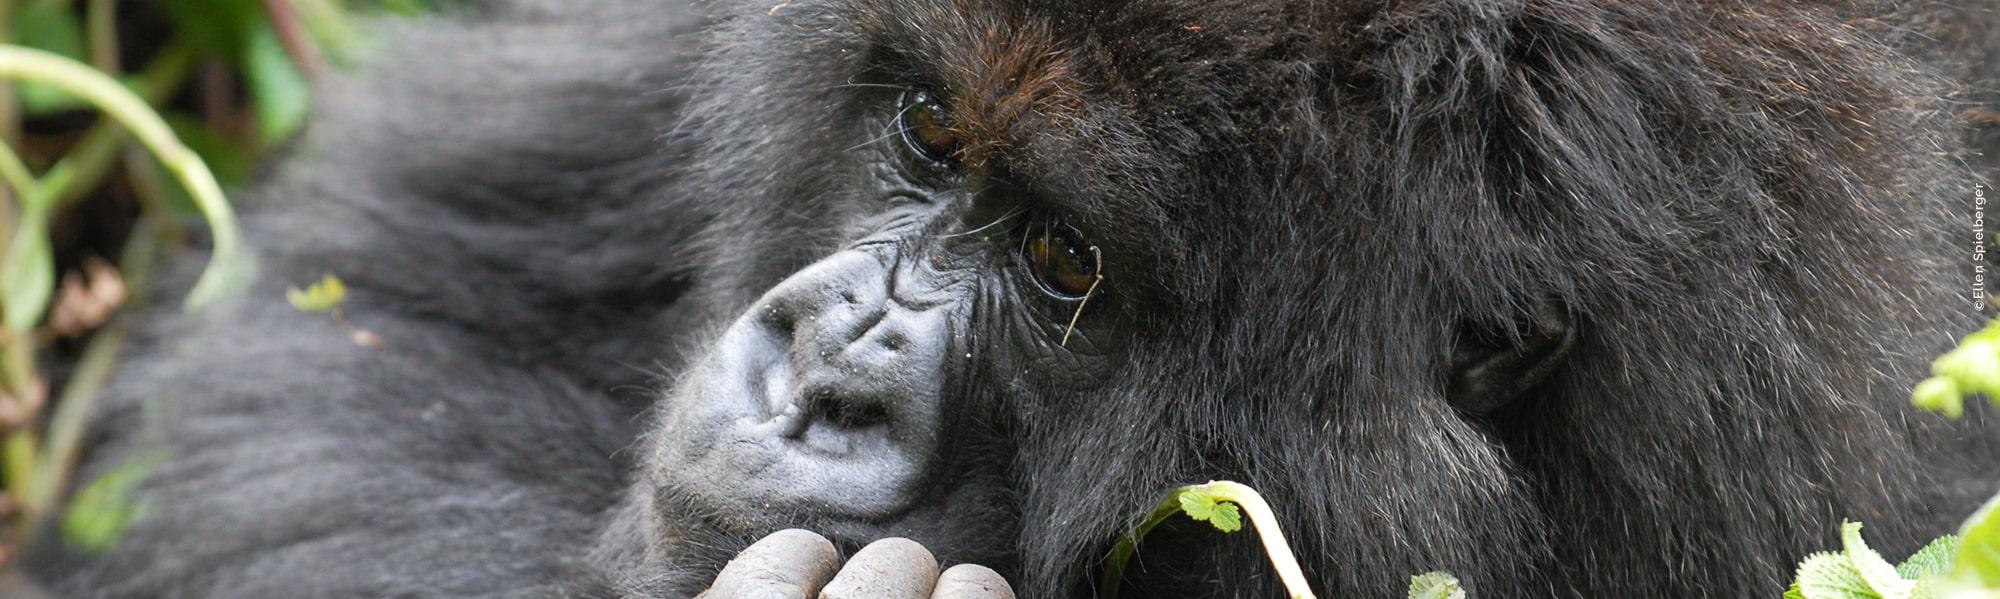 Ruanda Reisen mit Gorilla-Trekking